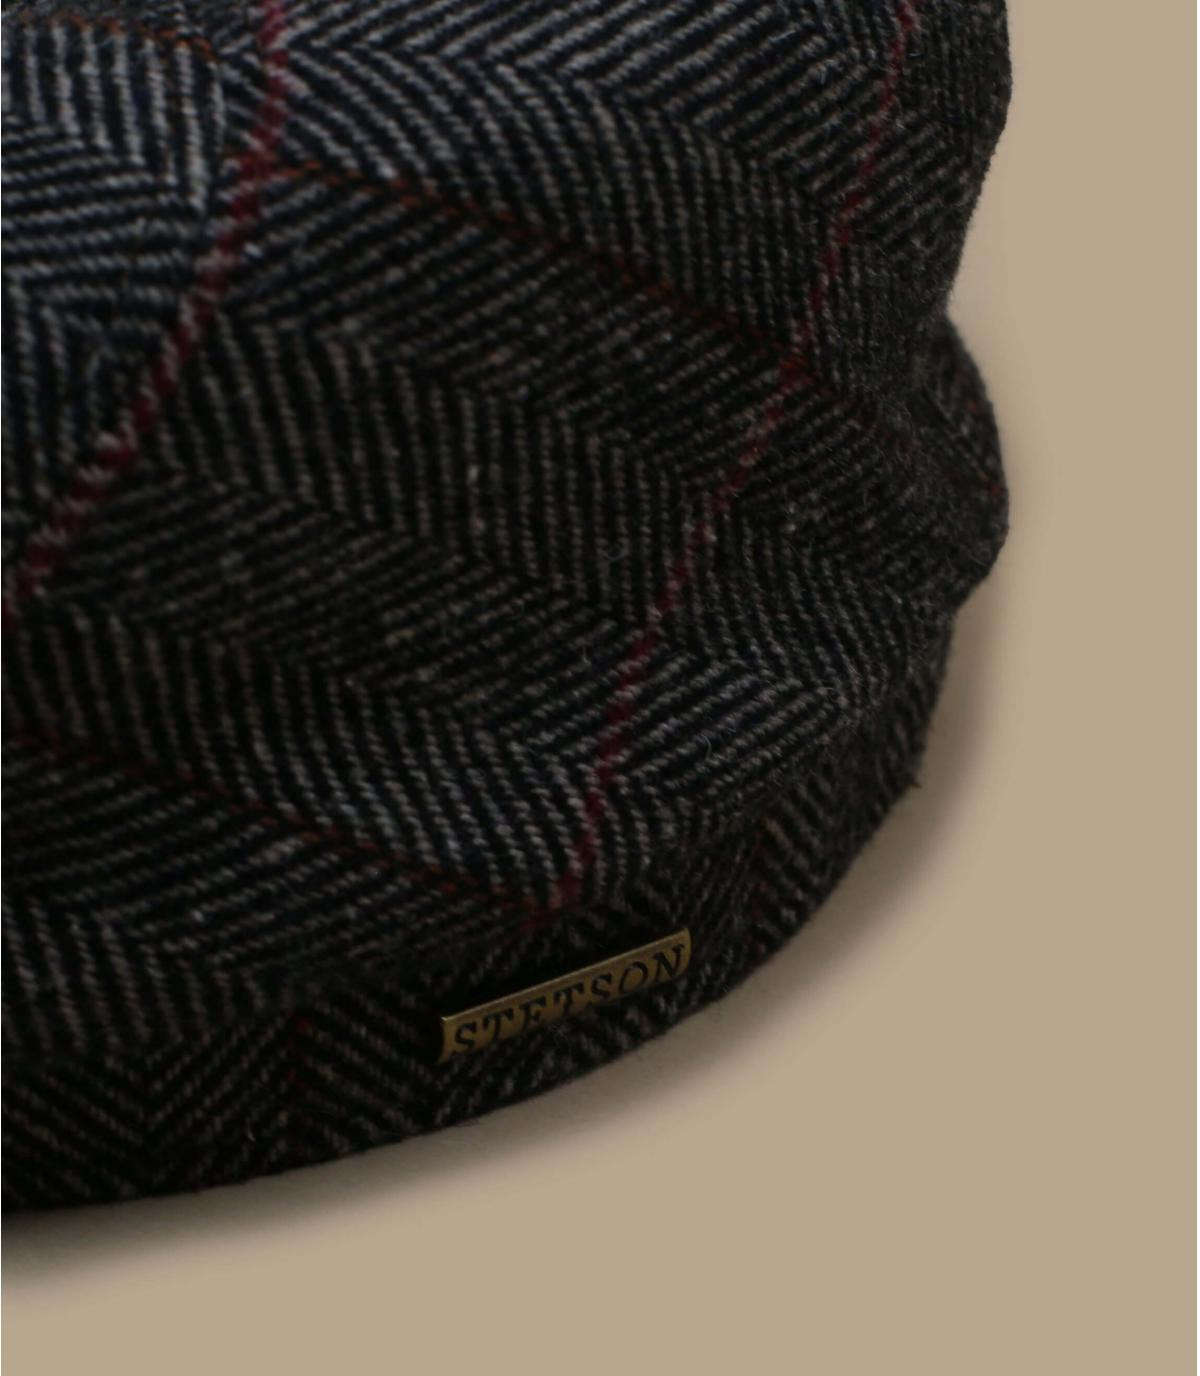 Details Oregon wool - Abbildung 2